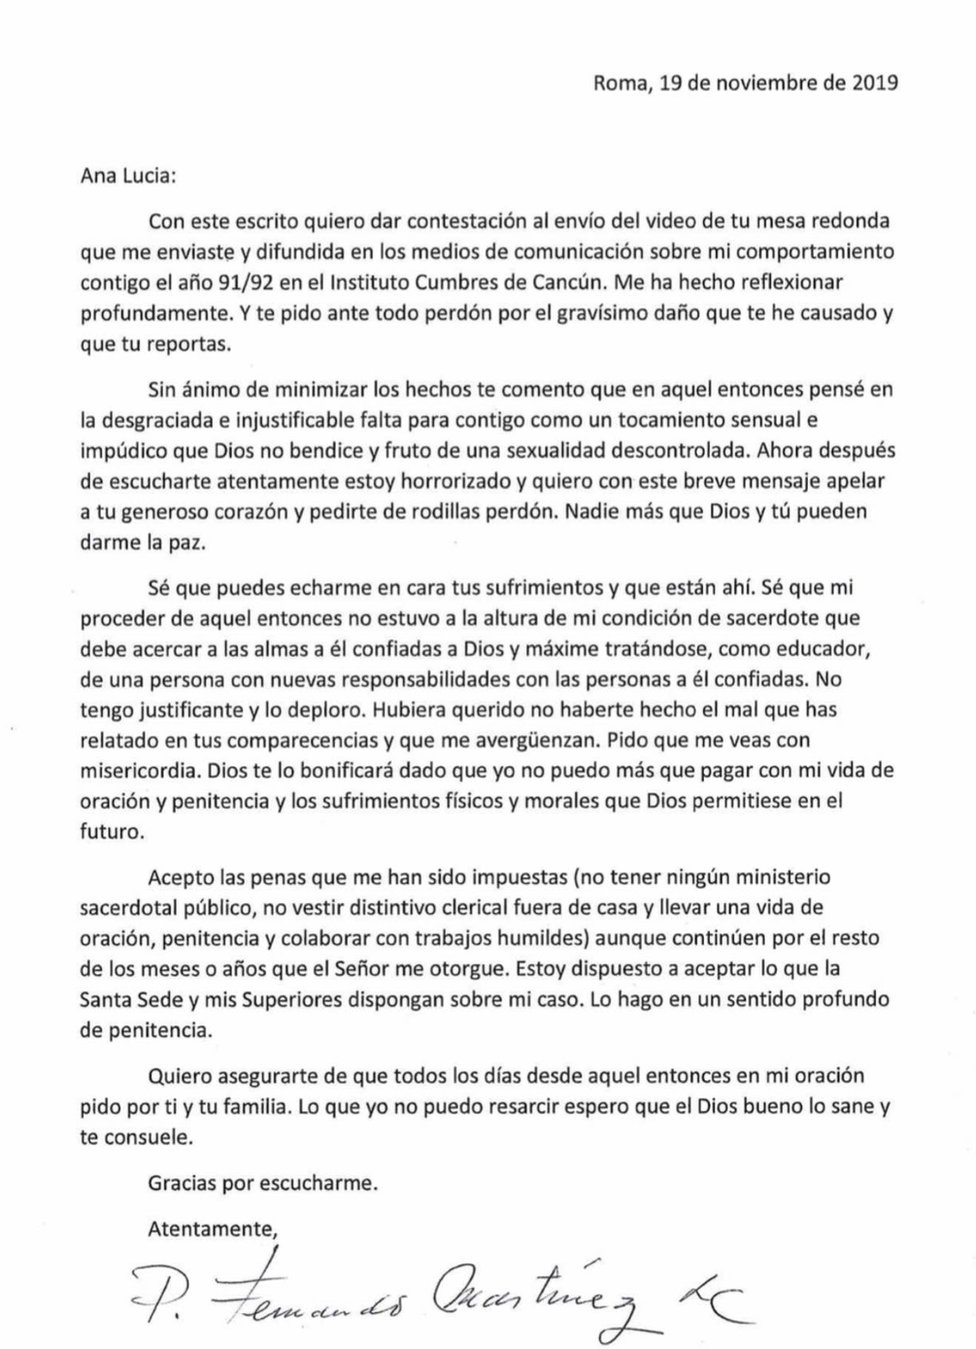 Carta de Fernando Martínez pidiendo perdón a Ana Lucía Salazar.